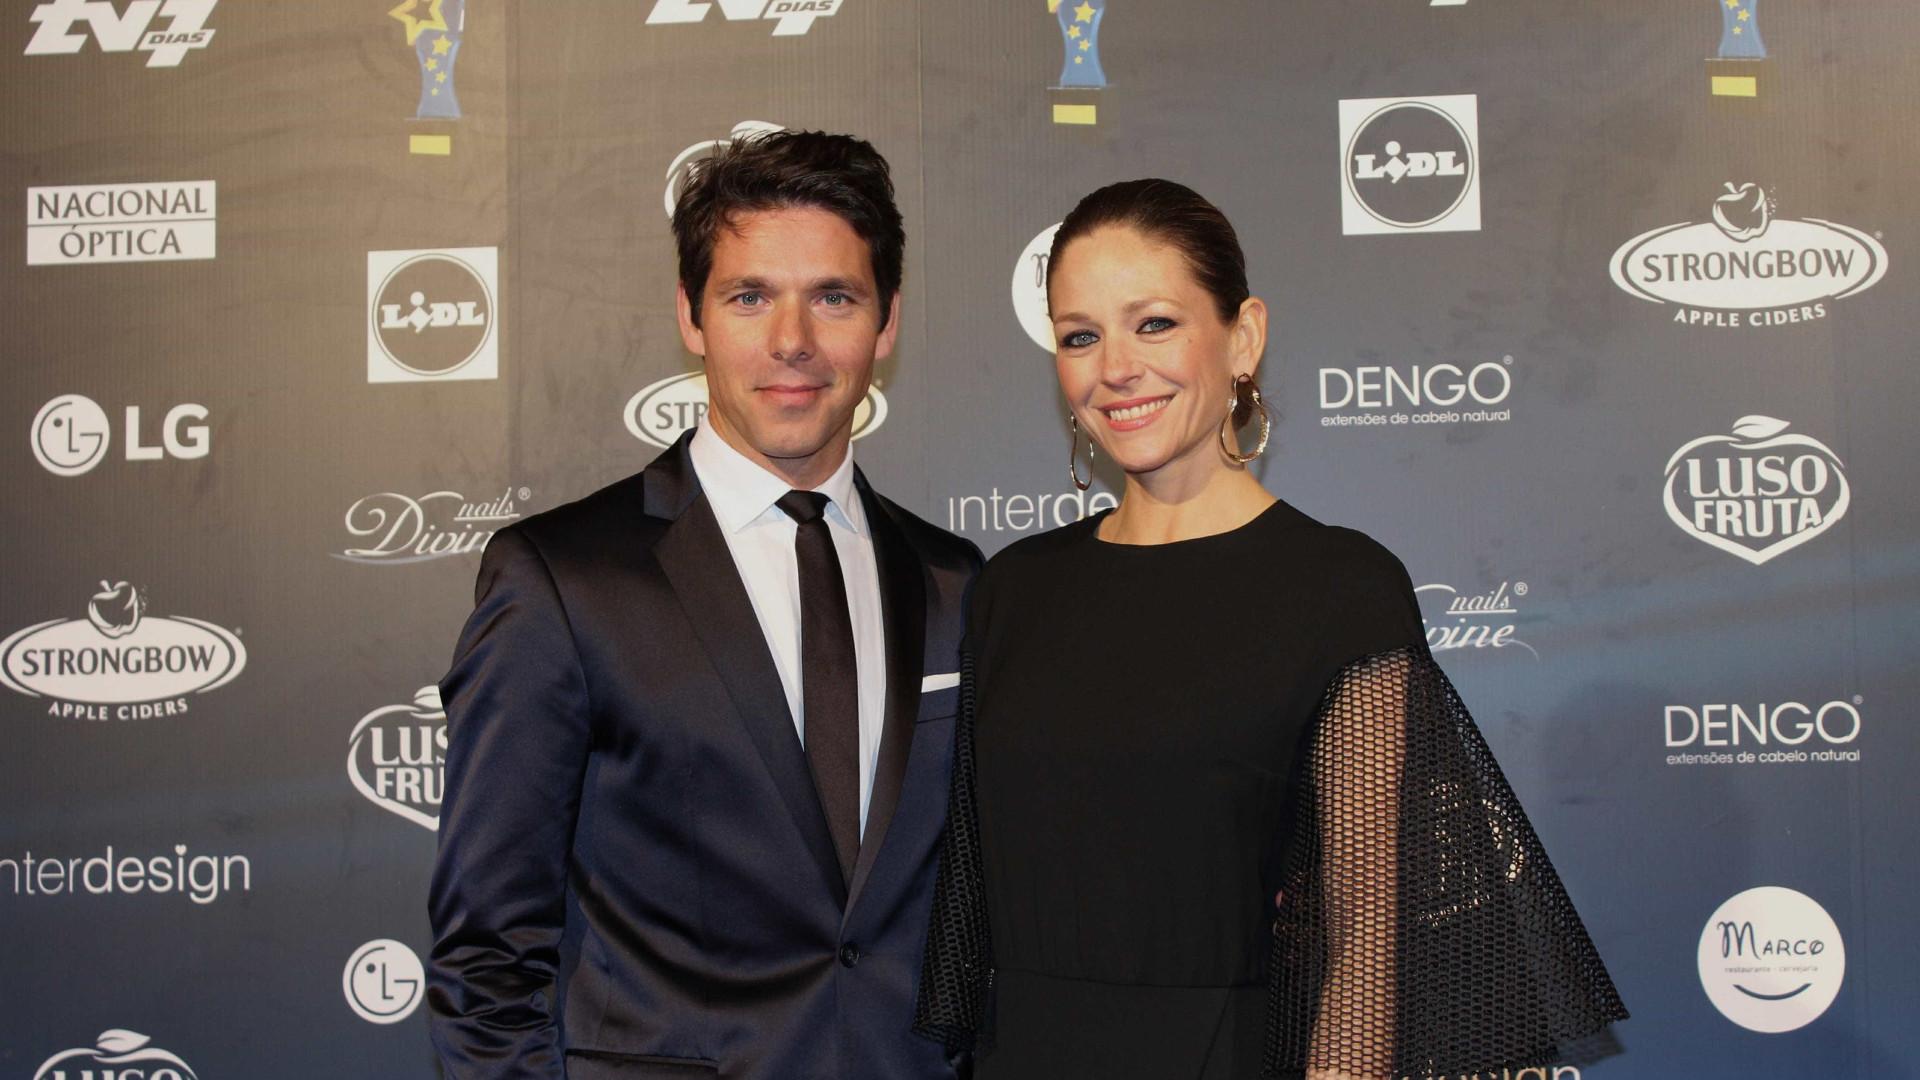 Jorge Corrula e Paula Lobo Antunes arrasam na gala da GQ